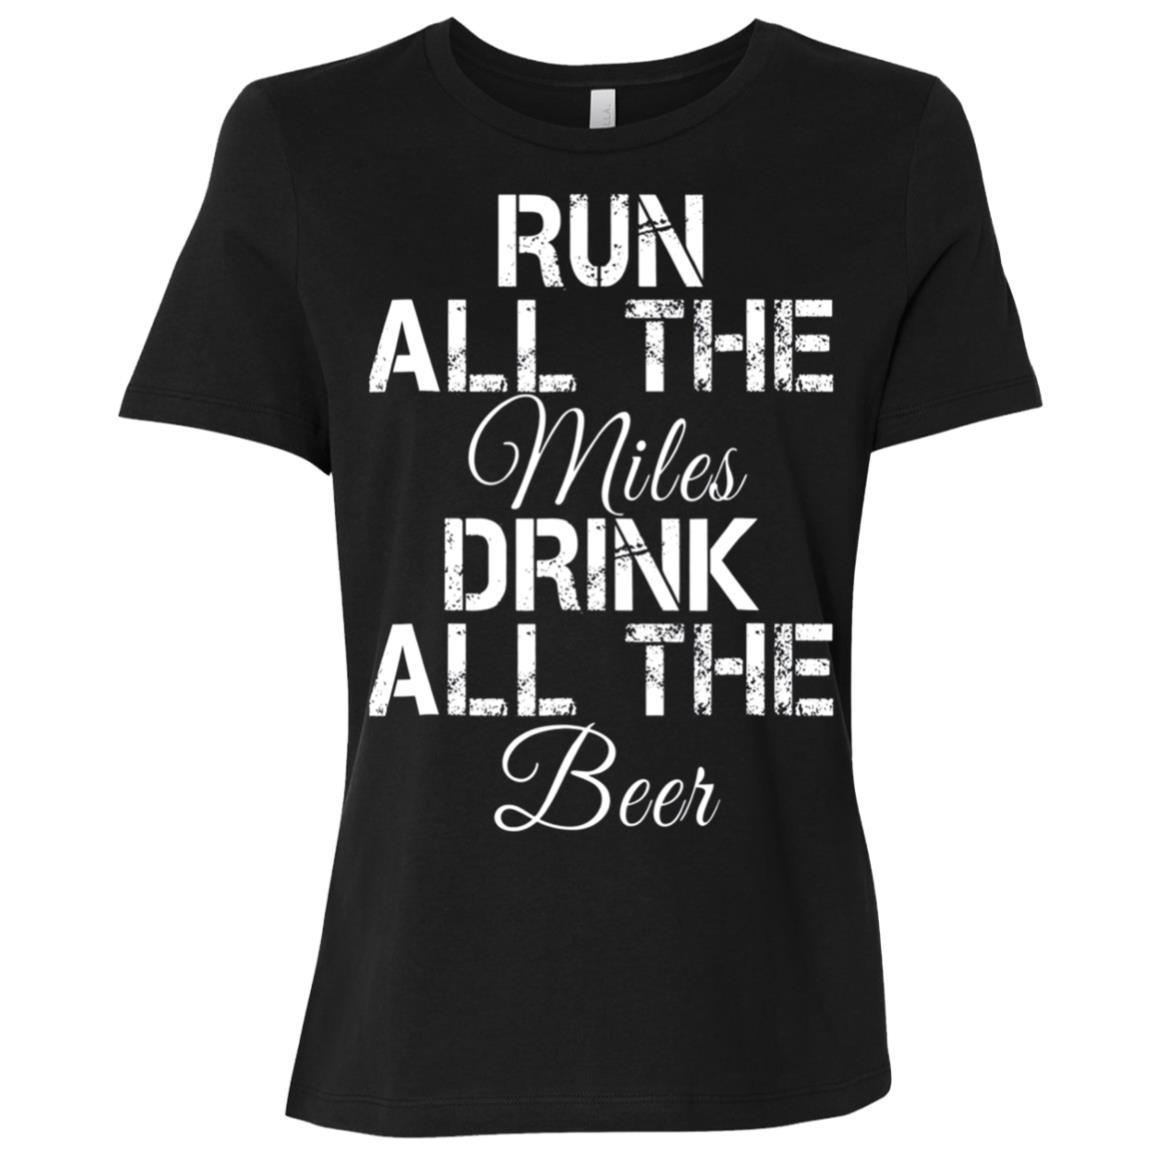 Run All The Miles Drink All The Beer Running Women Short Sleeve T-Shirt